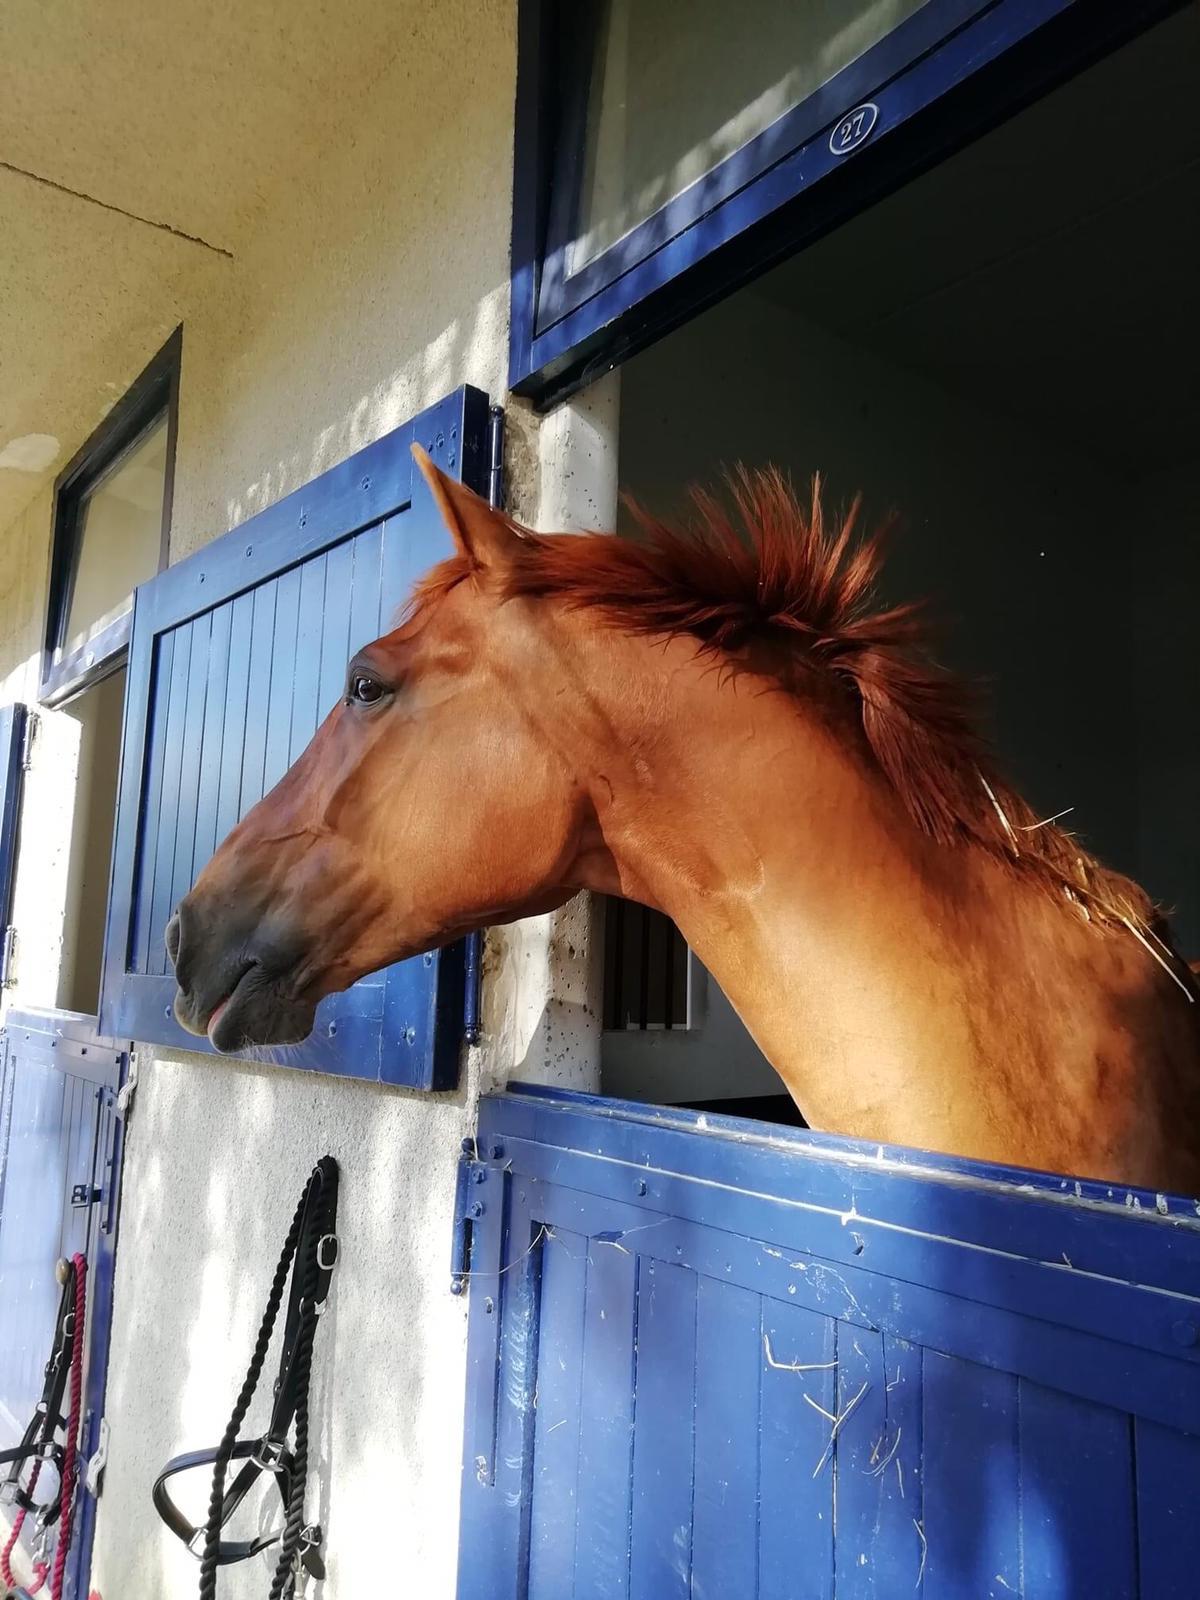 Chestnut horse client of Allium Healing